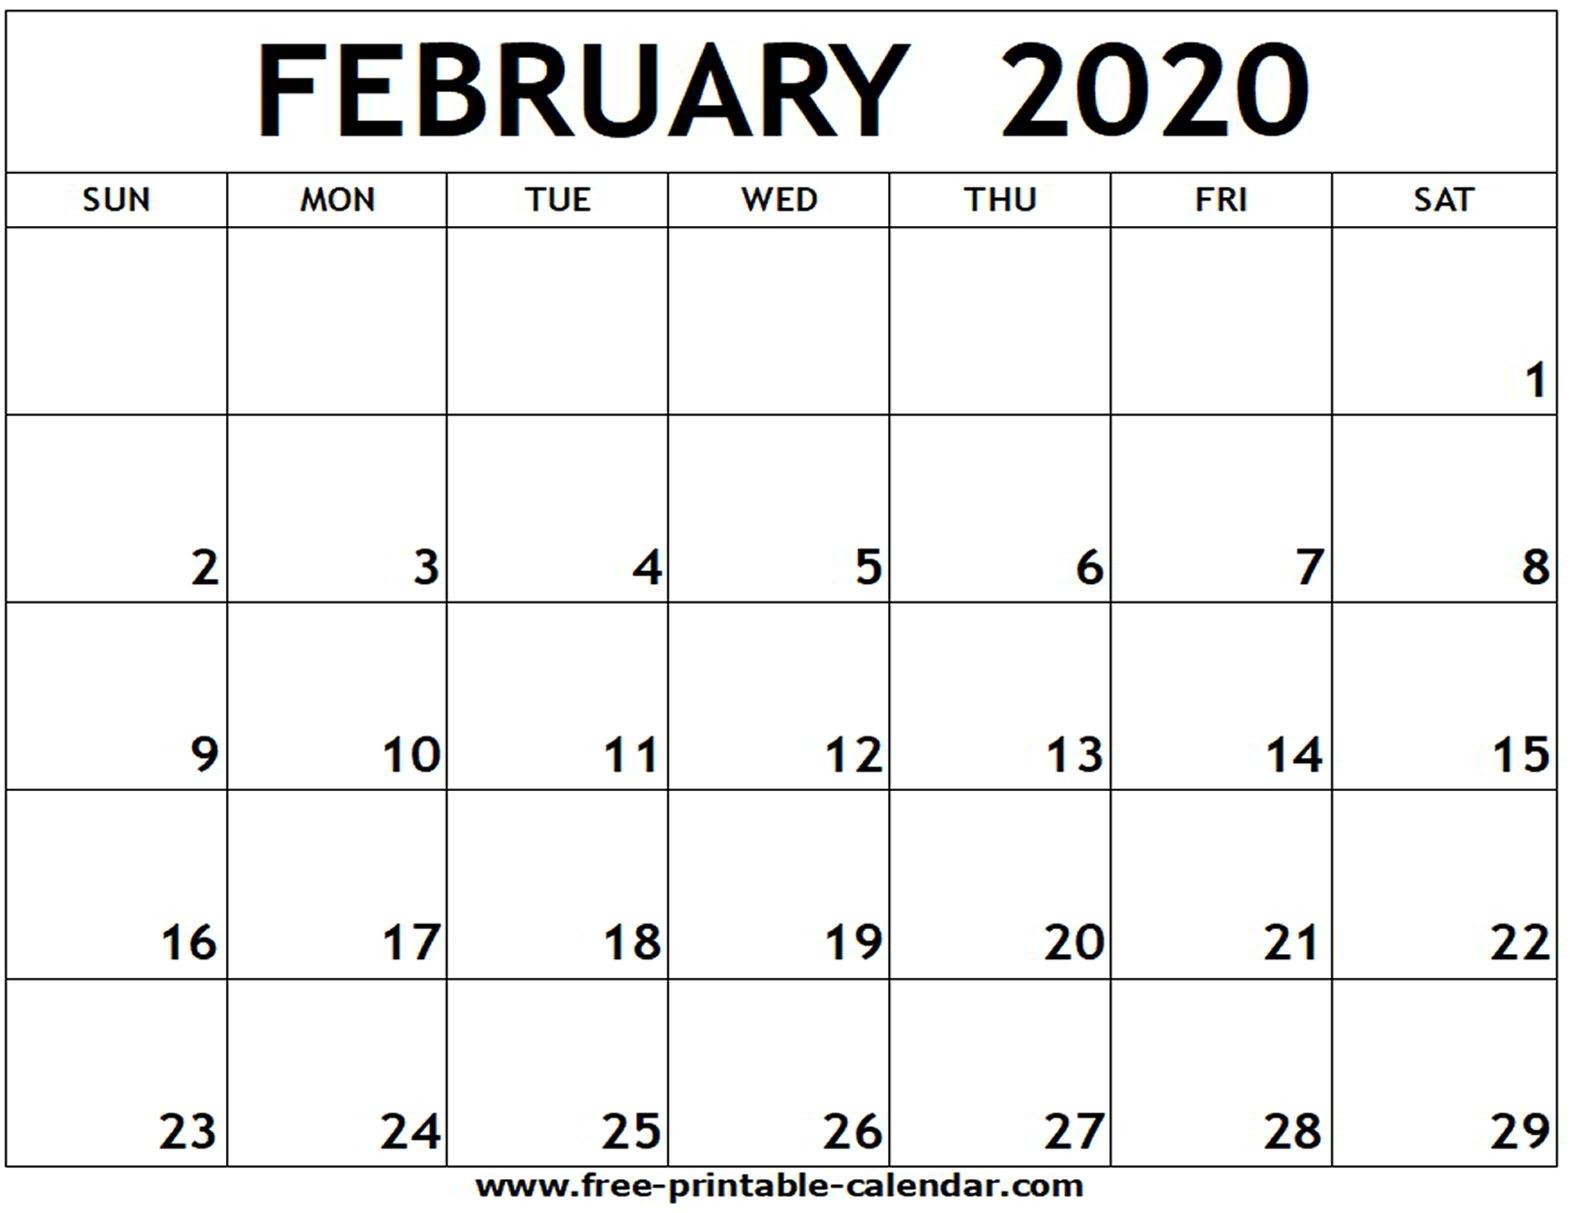 February 2020 Printable Calendar - Free-Printable-Calendar within 2020 Fill In Calendar